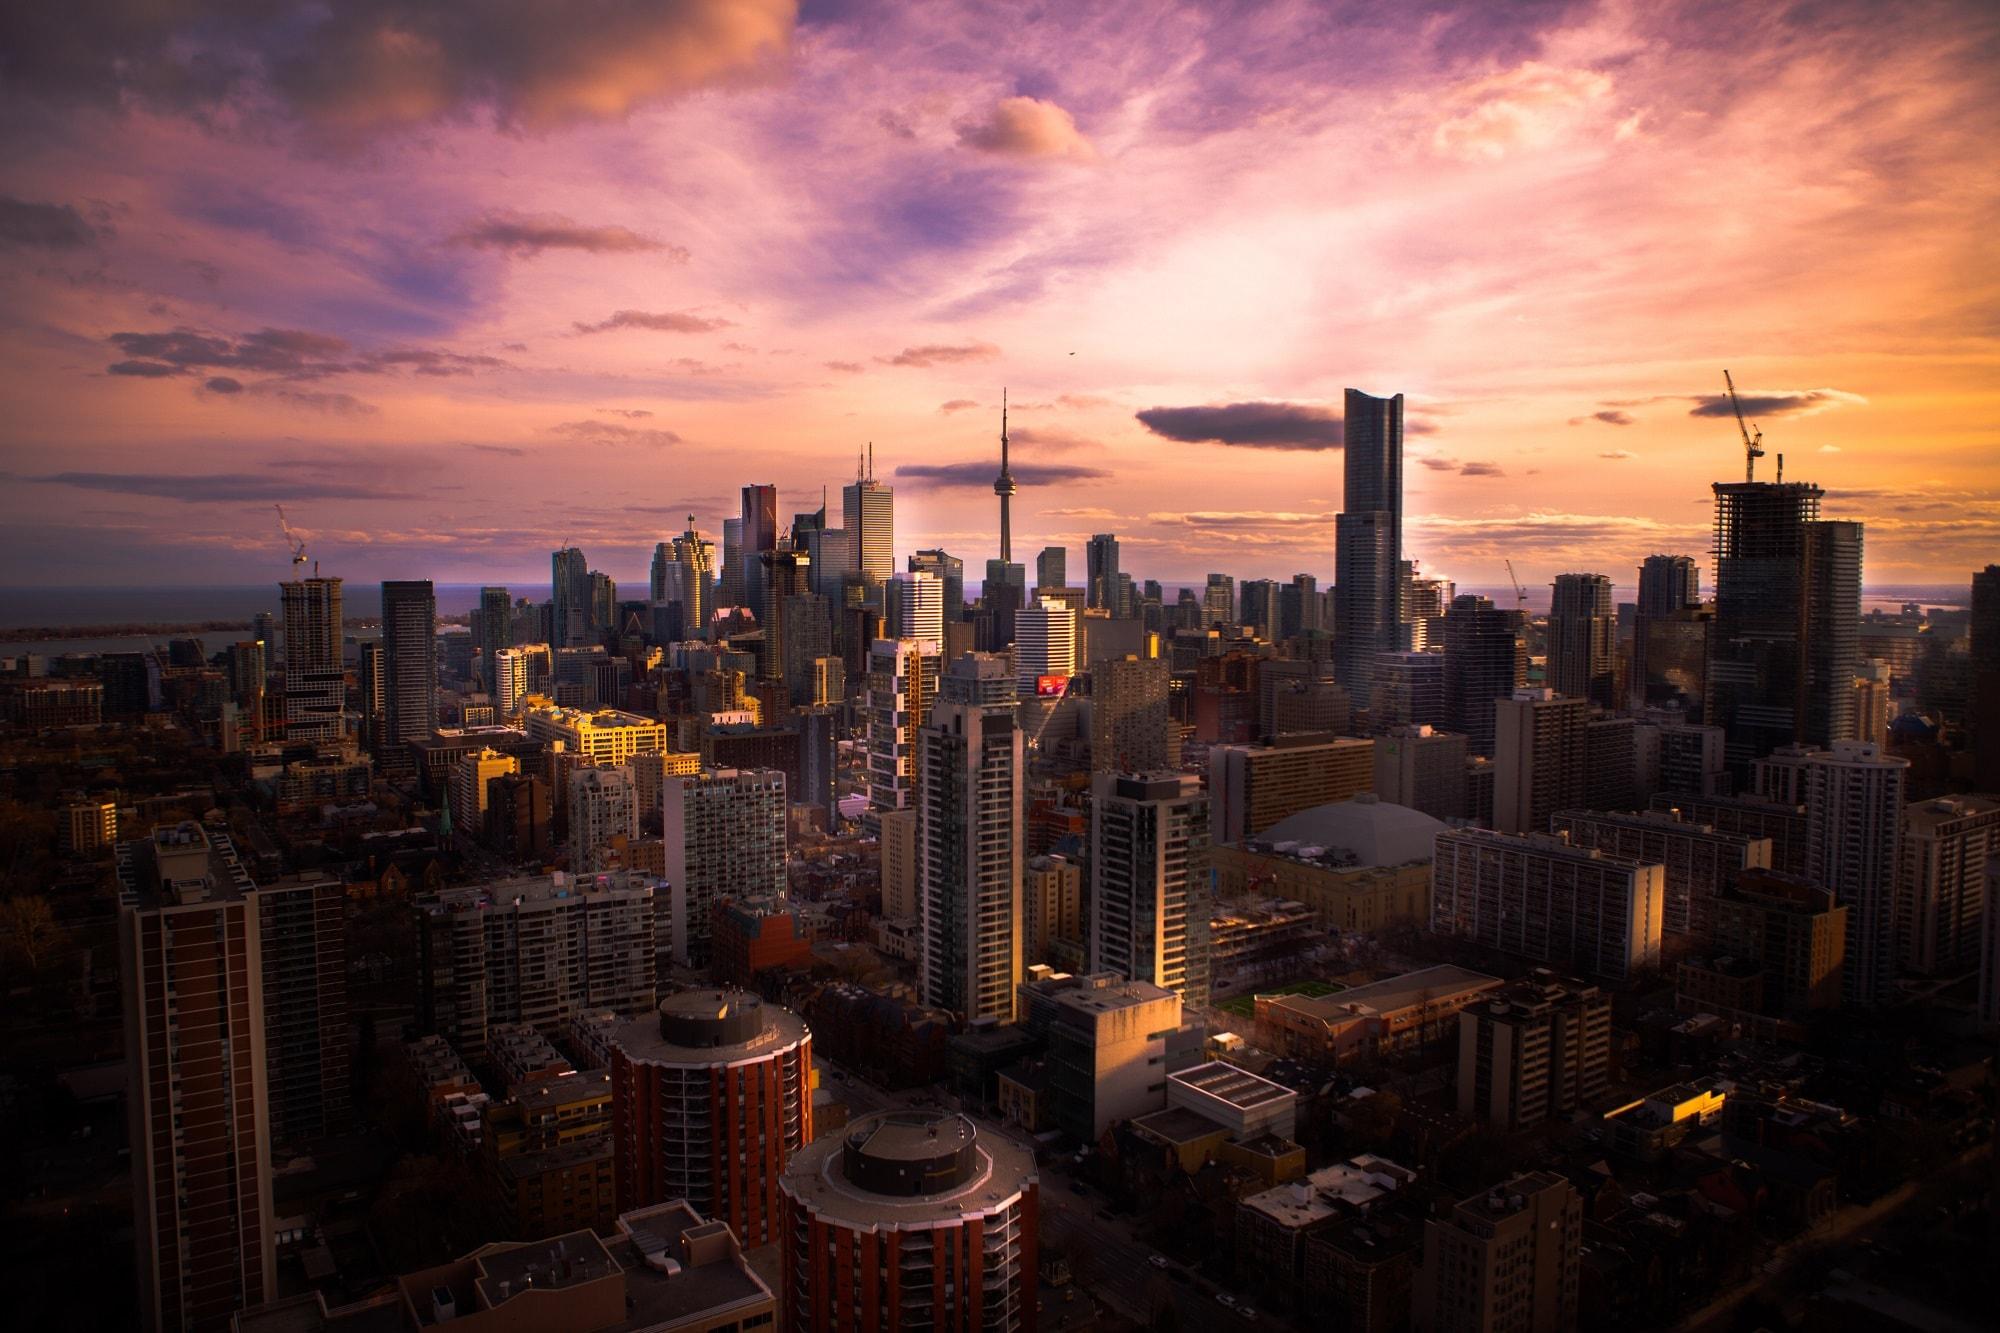 #7. Toronto